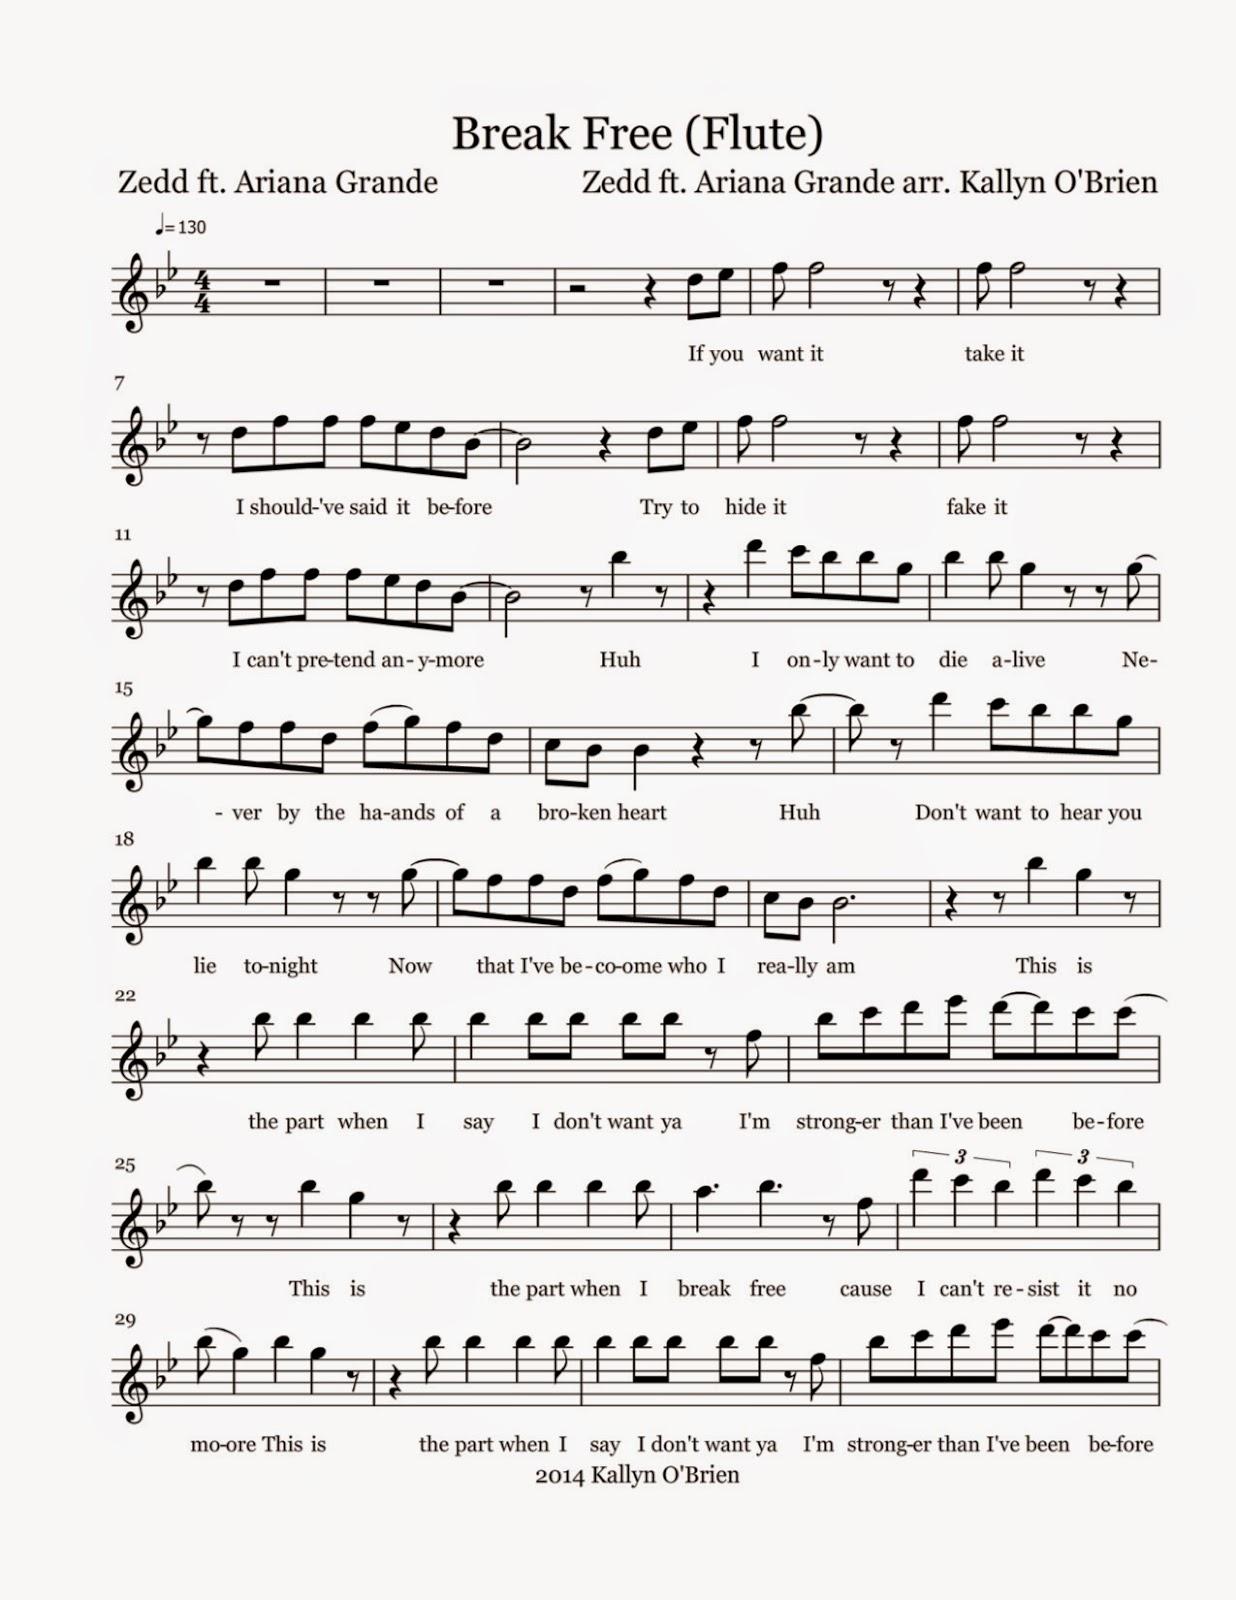 Flute Sheet Music: Break Free - Sheet Music